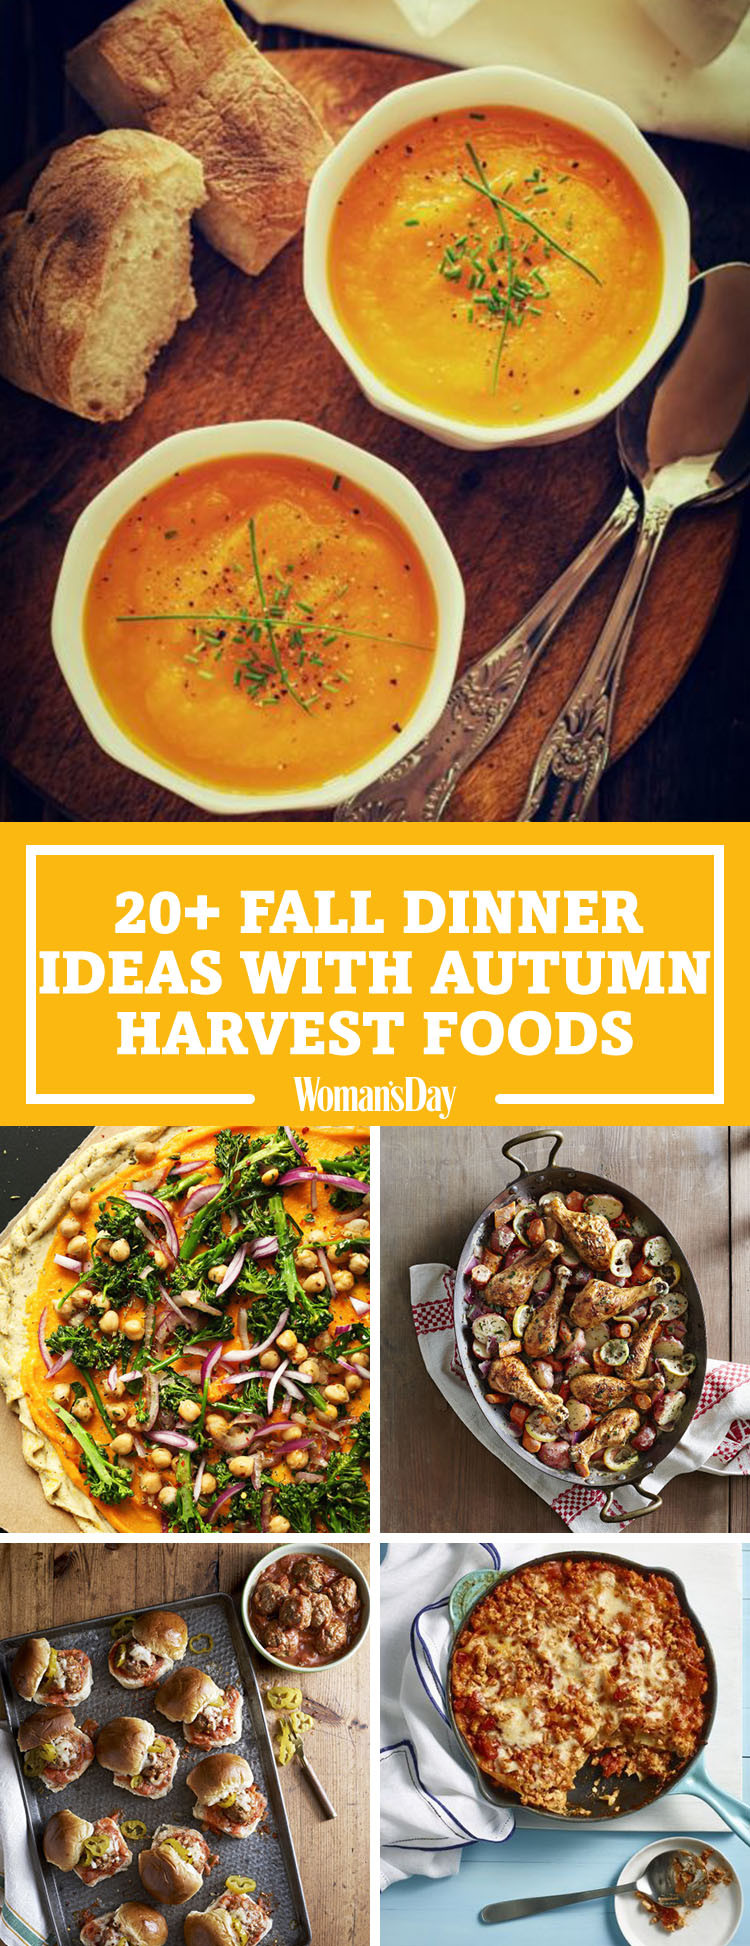 Fall Dinner Ideas  26 Easy Fall Dinner Ideas Best Dinner Recipes for Autumn